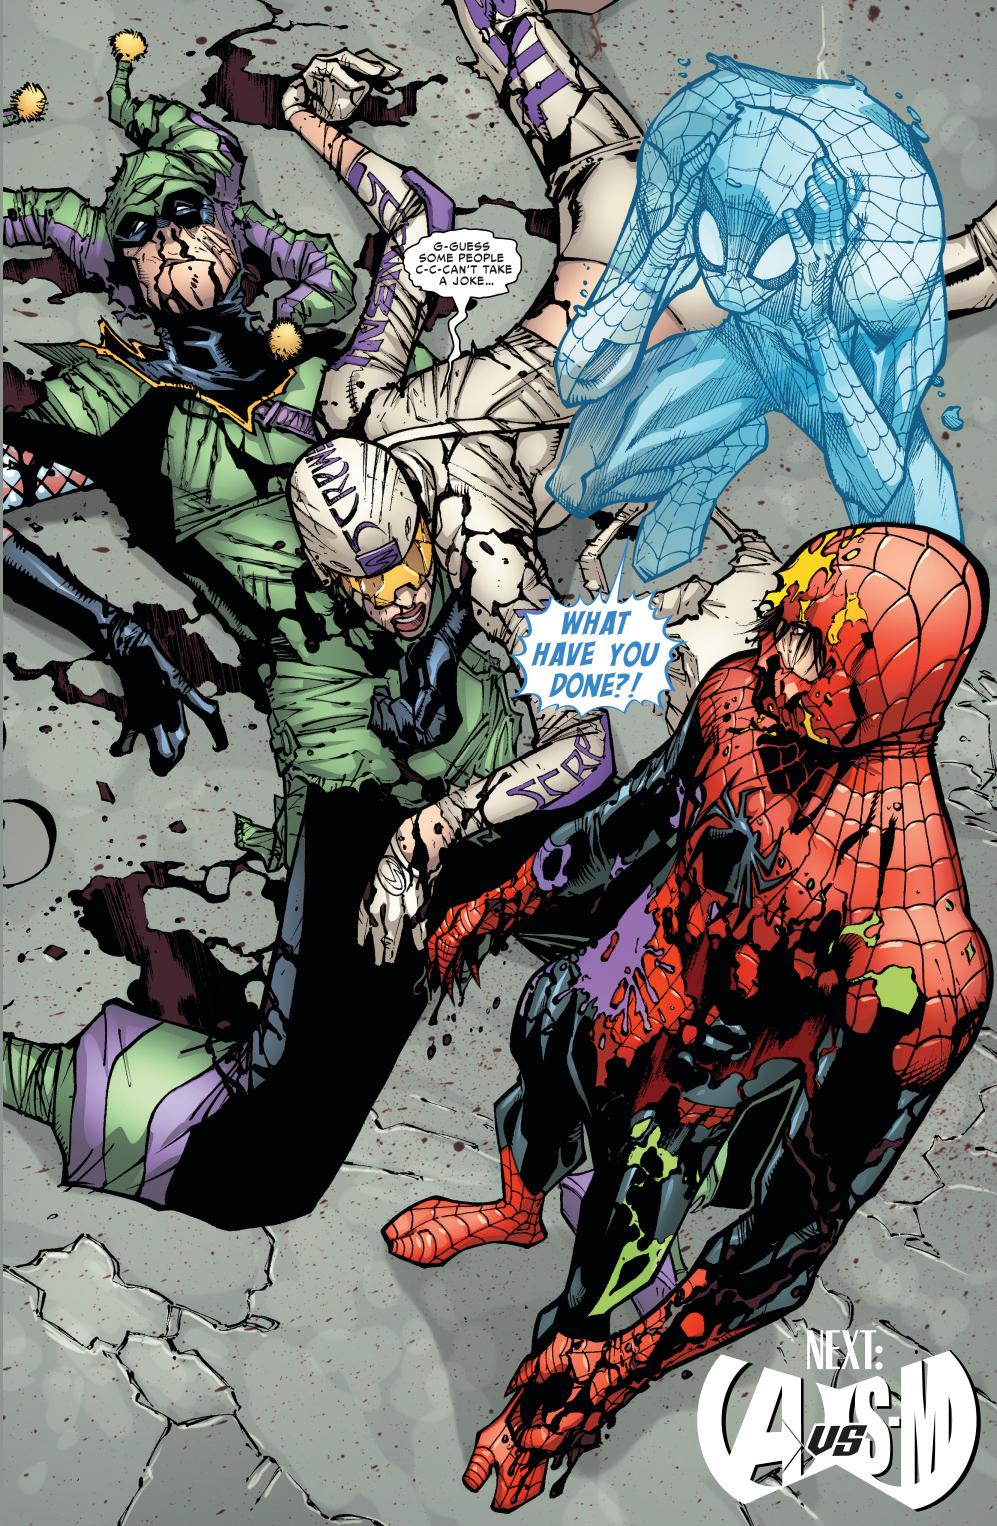 superior spider-man vs jester and screwball